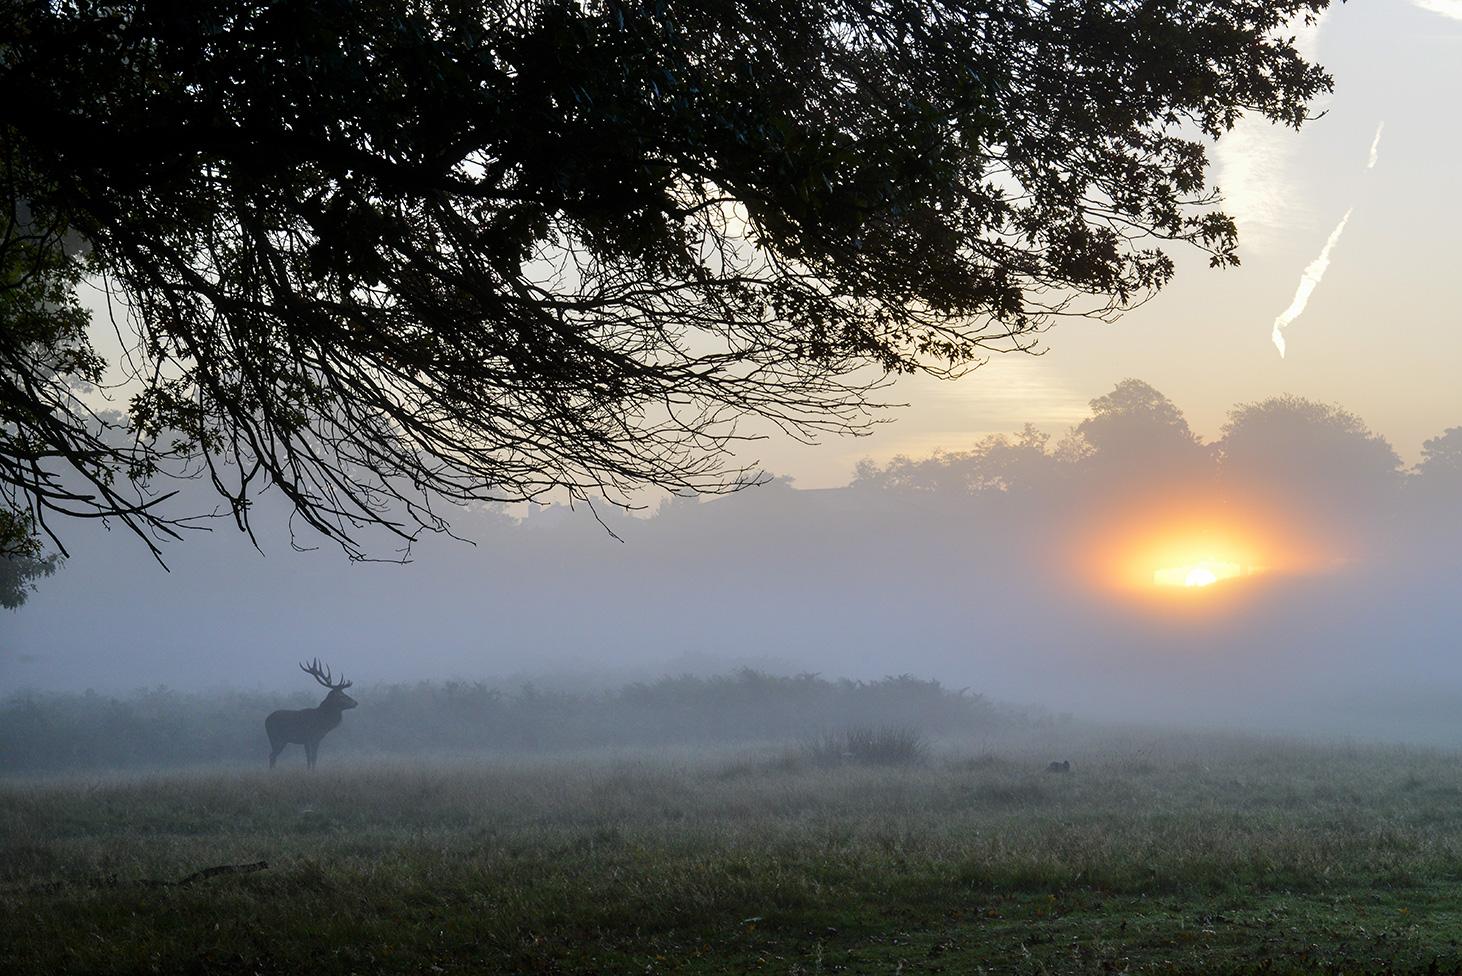 Stag at Sunrise - Ignacio Medem - Portfolio Natural, Fotografía de Naturaleza de Autor